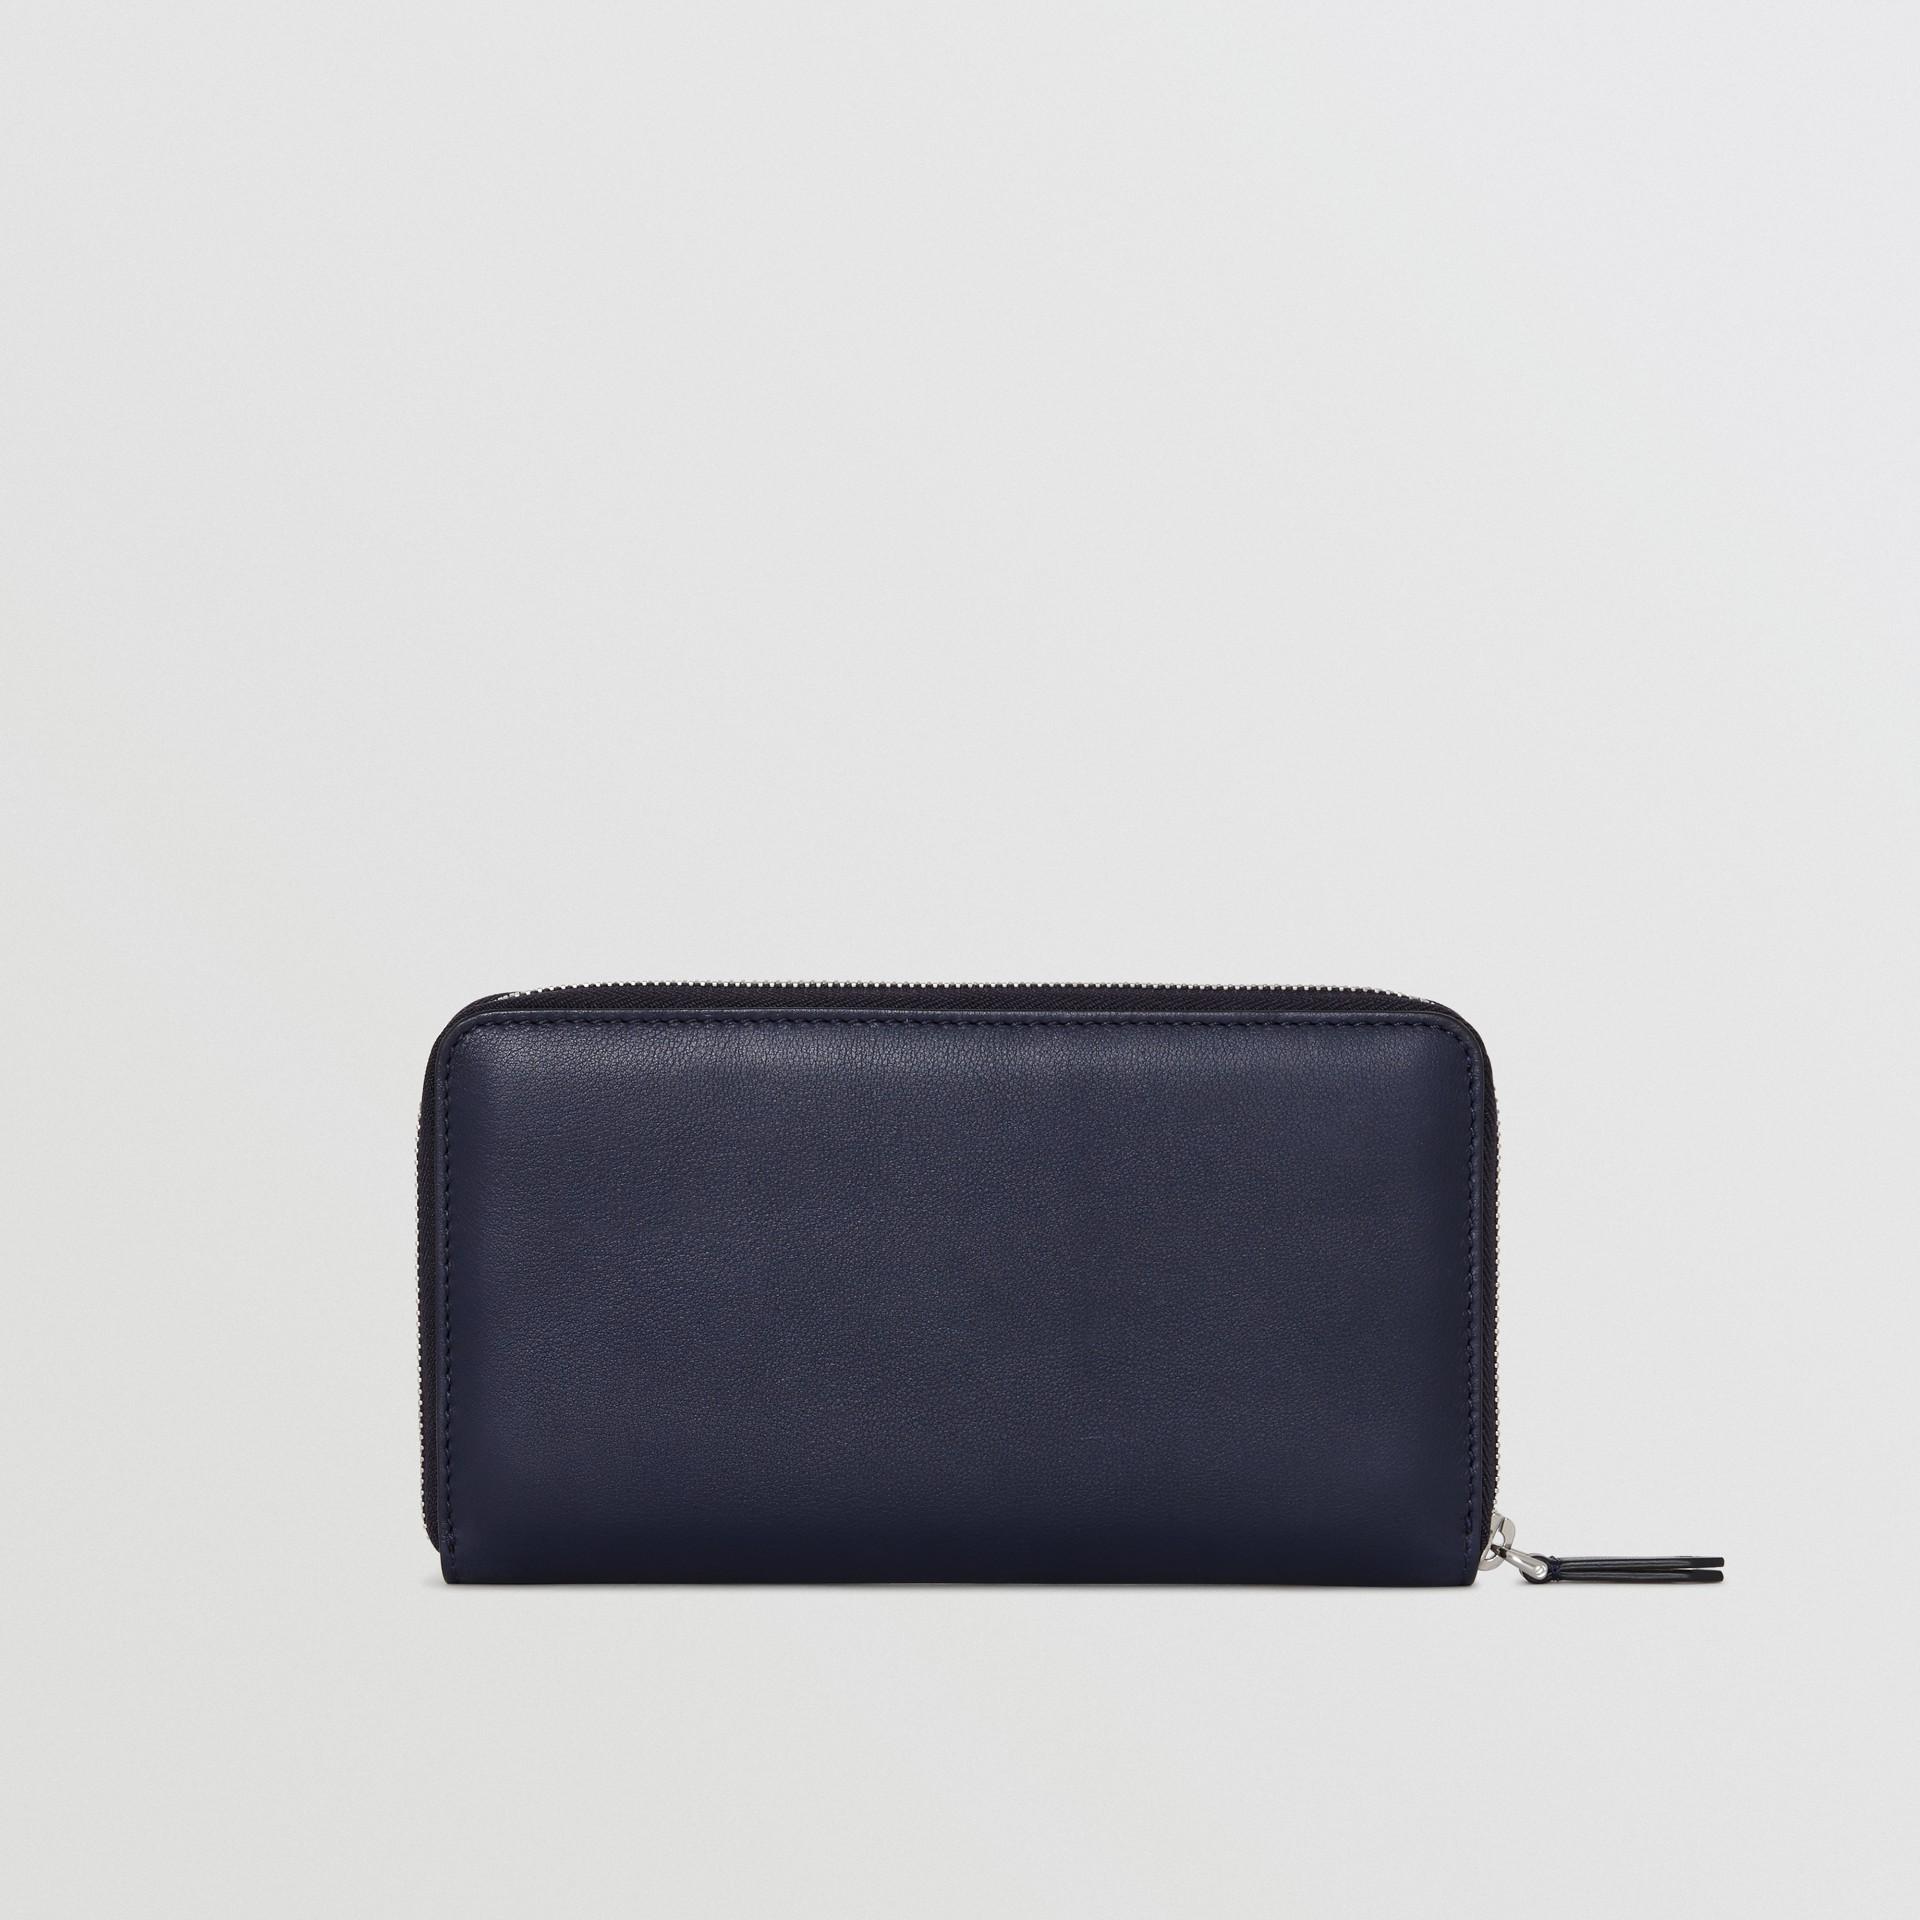 Embossed Crest Leather Ziparound Wallet in Regency Blue - Men | Burberry Australia - gallery image 5